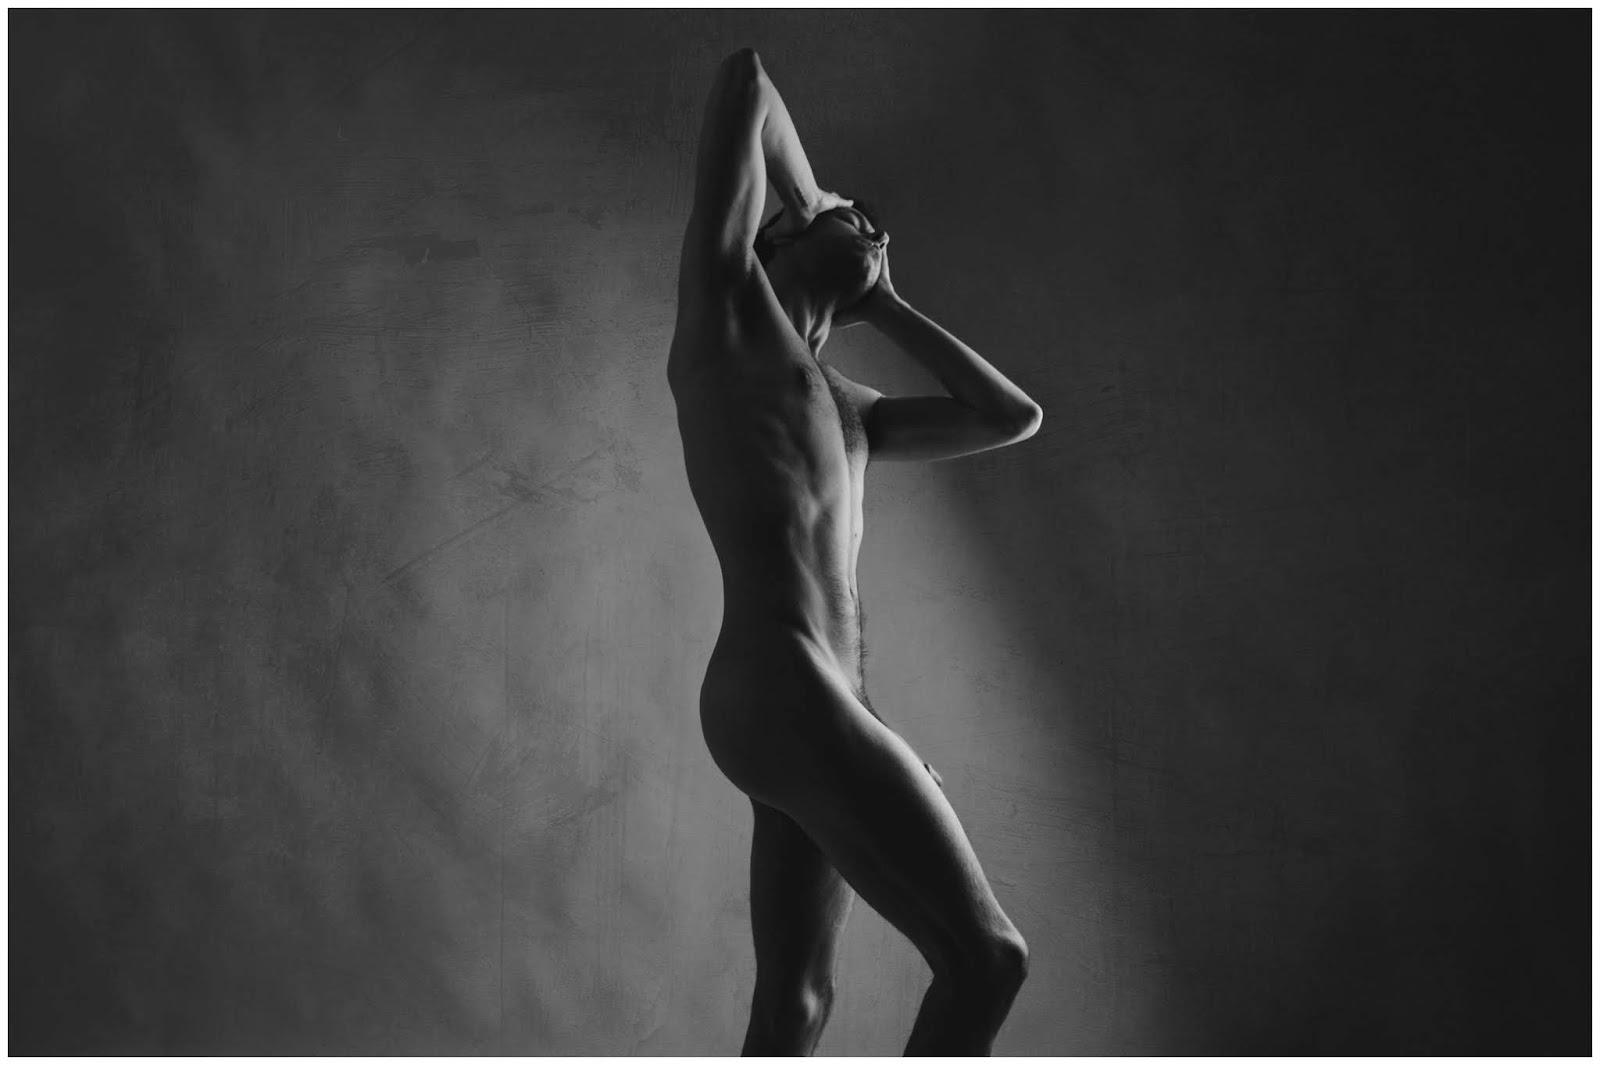 Thick DicK, by PHANTASMA PHOTOGRAPHY (NSFW).